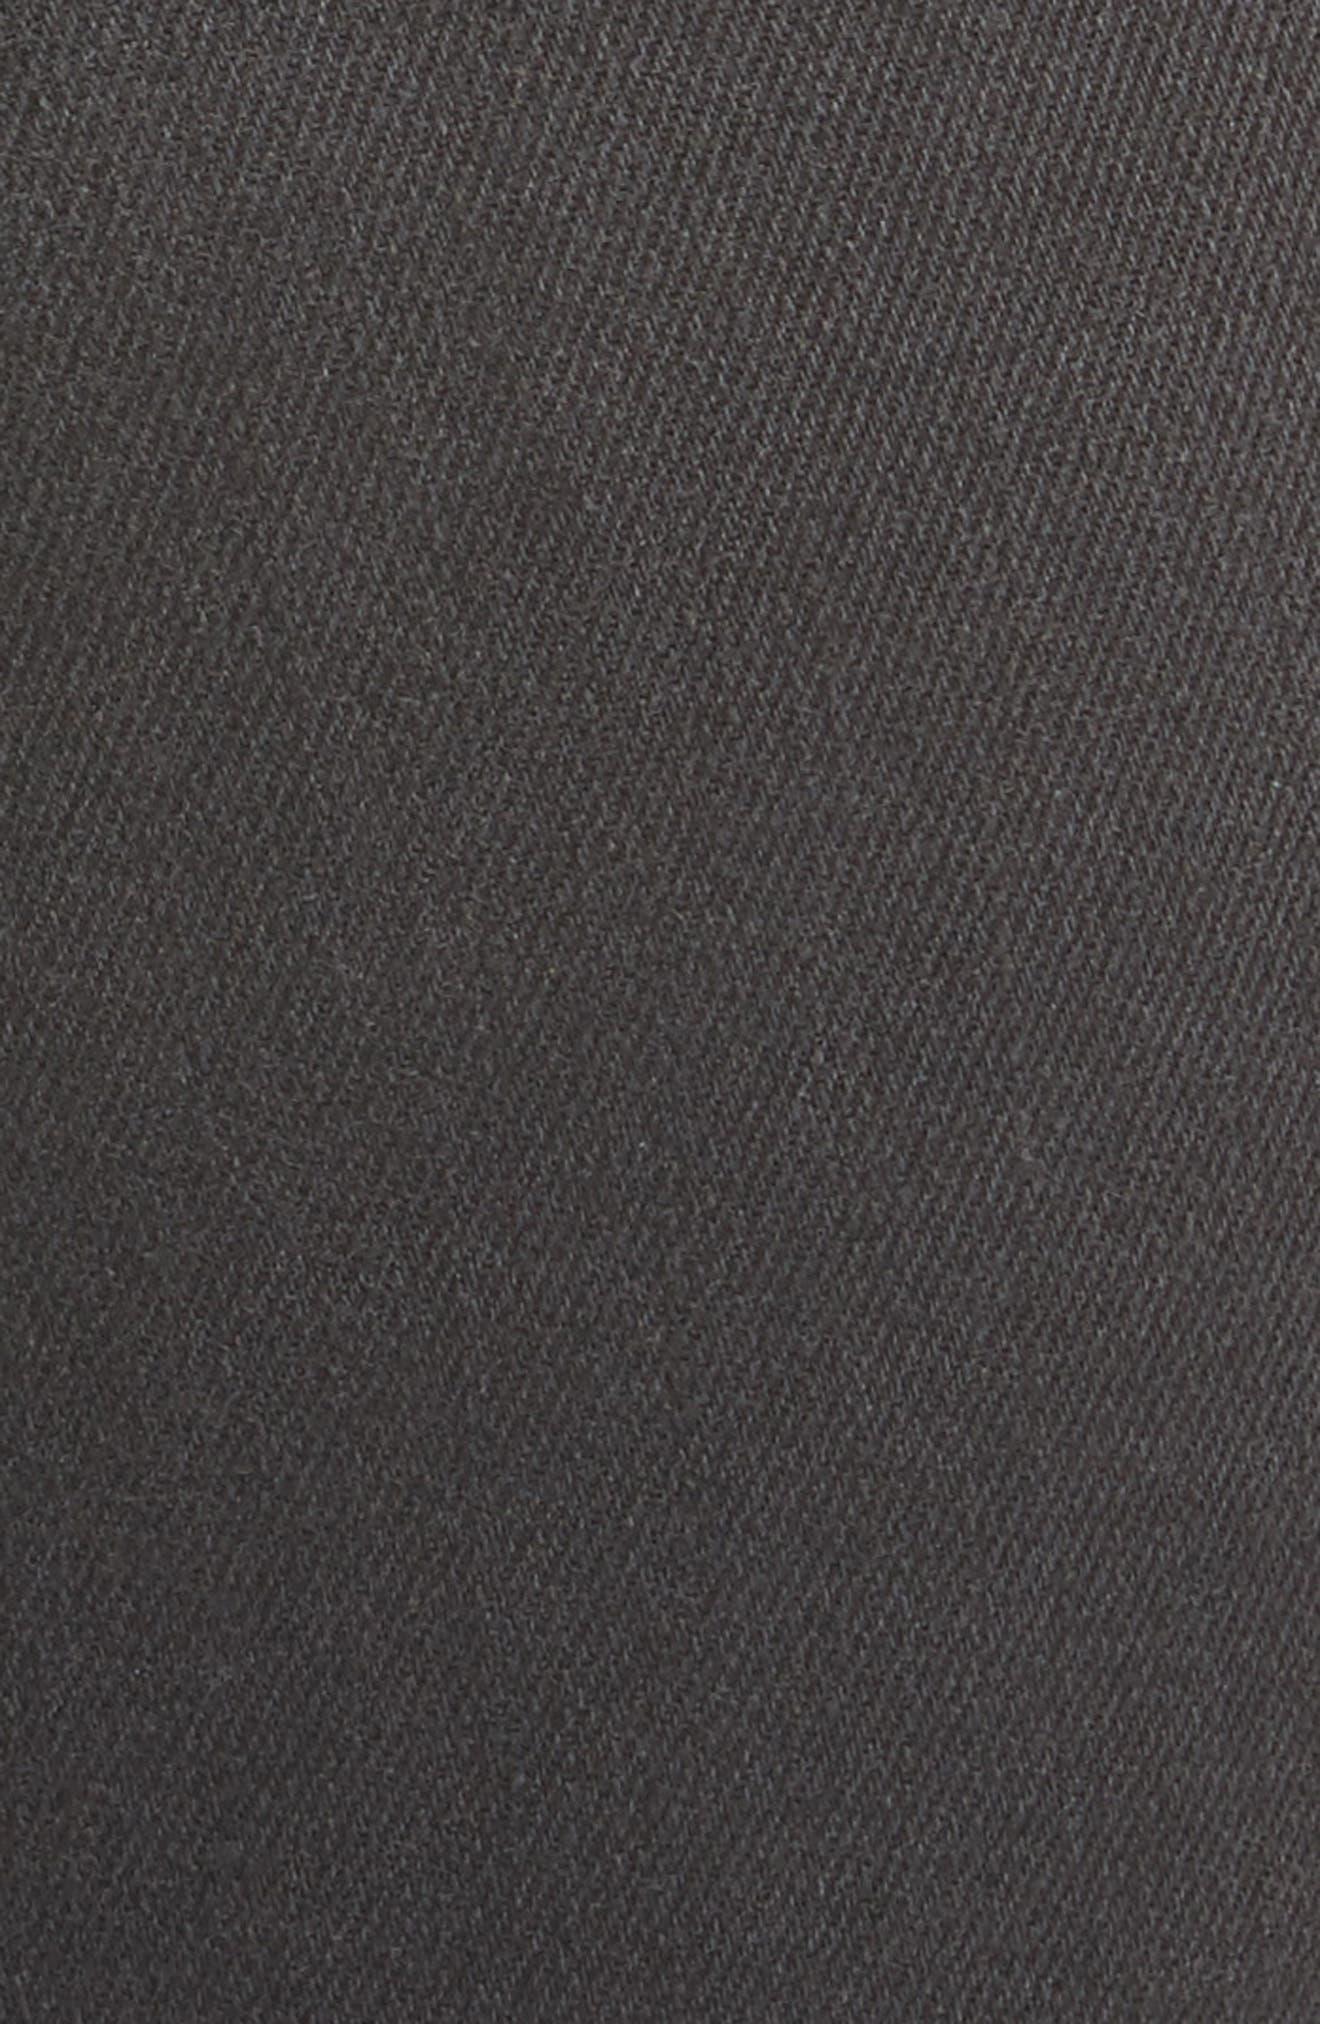 Audrina Ripped Straight Leg Jeans,                             Alternate thumbnail 6, color,                             Vintage Black Worn Destruct